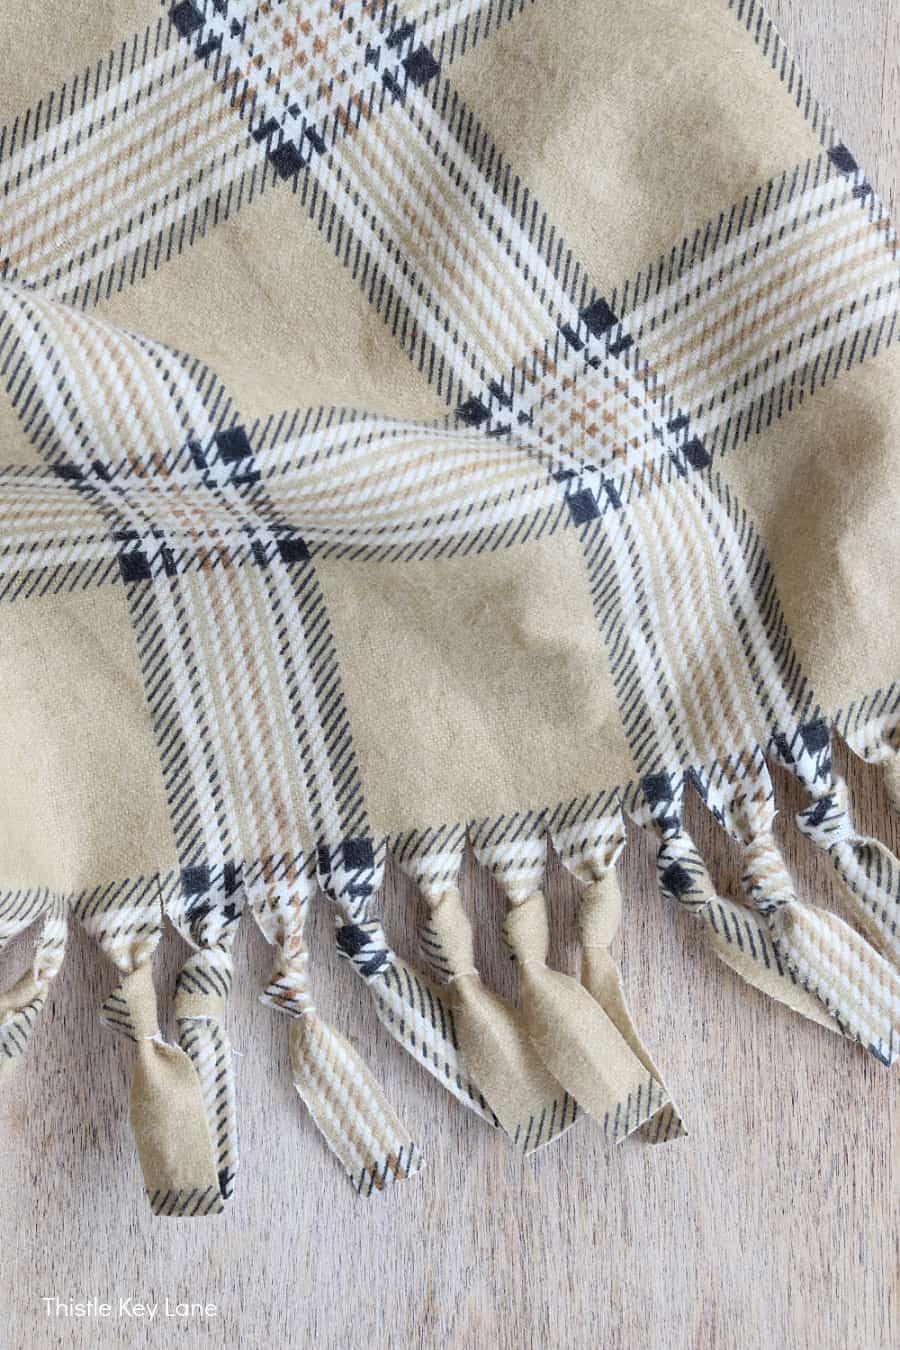 Knotted fringe on plaid fabric.